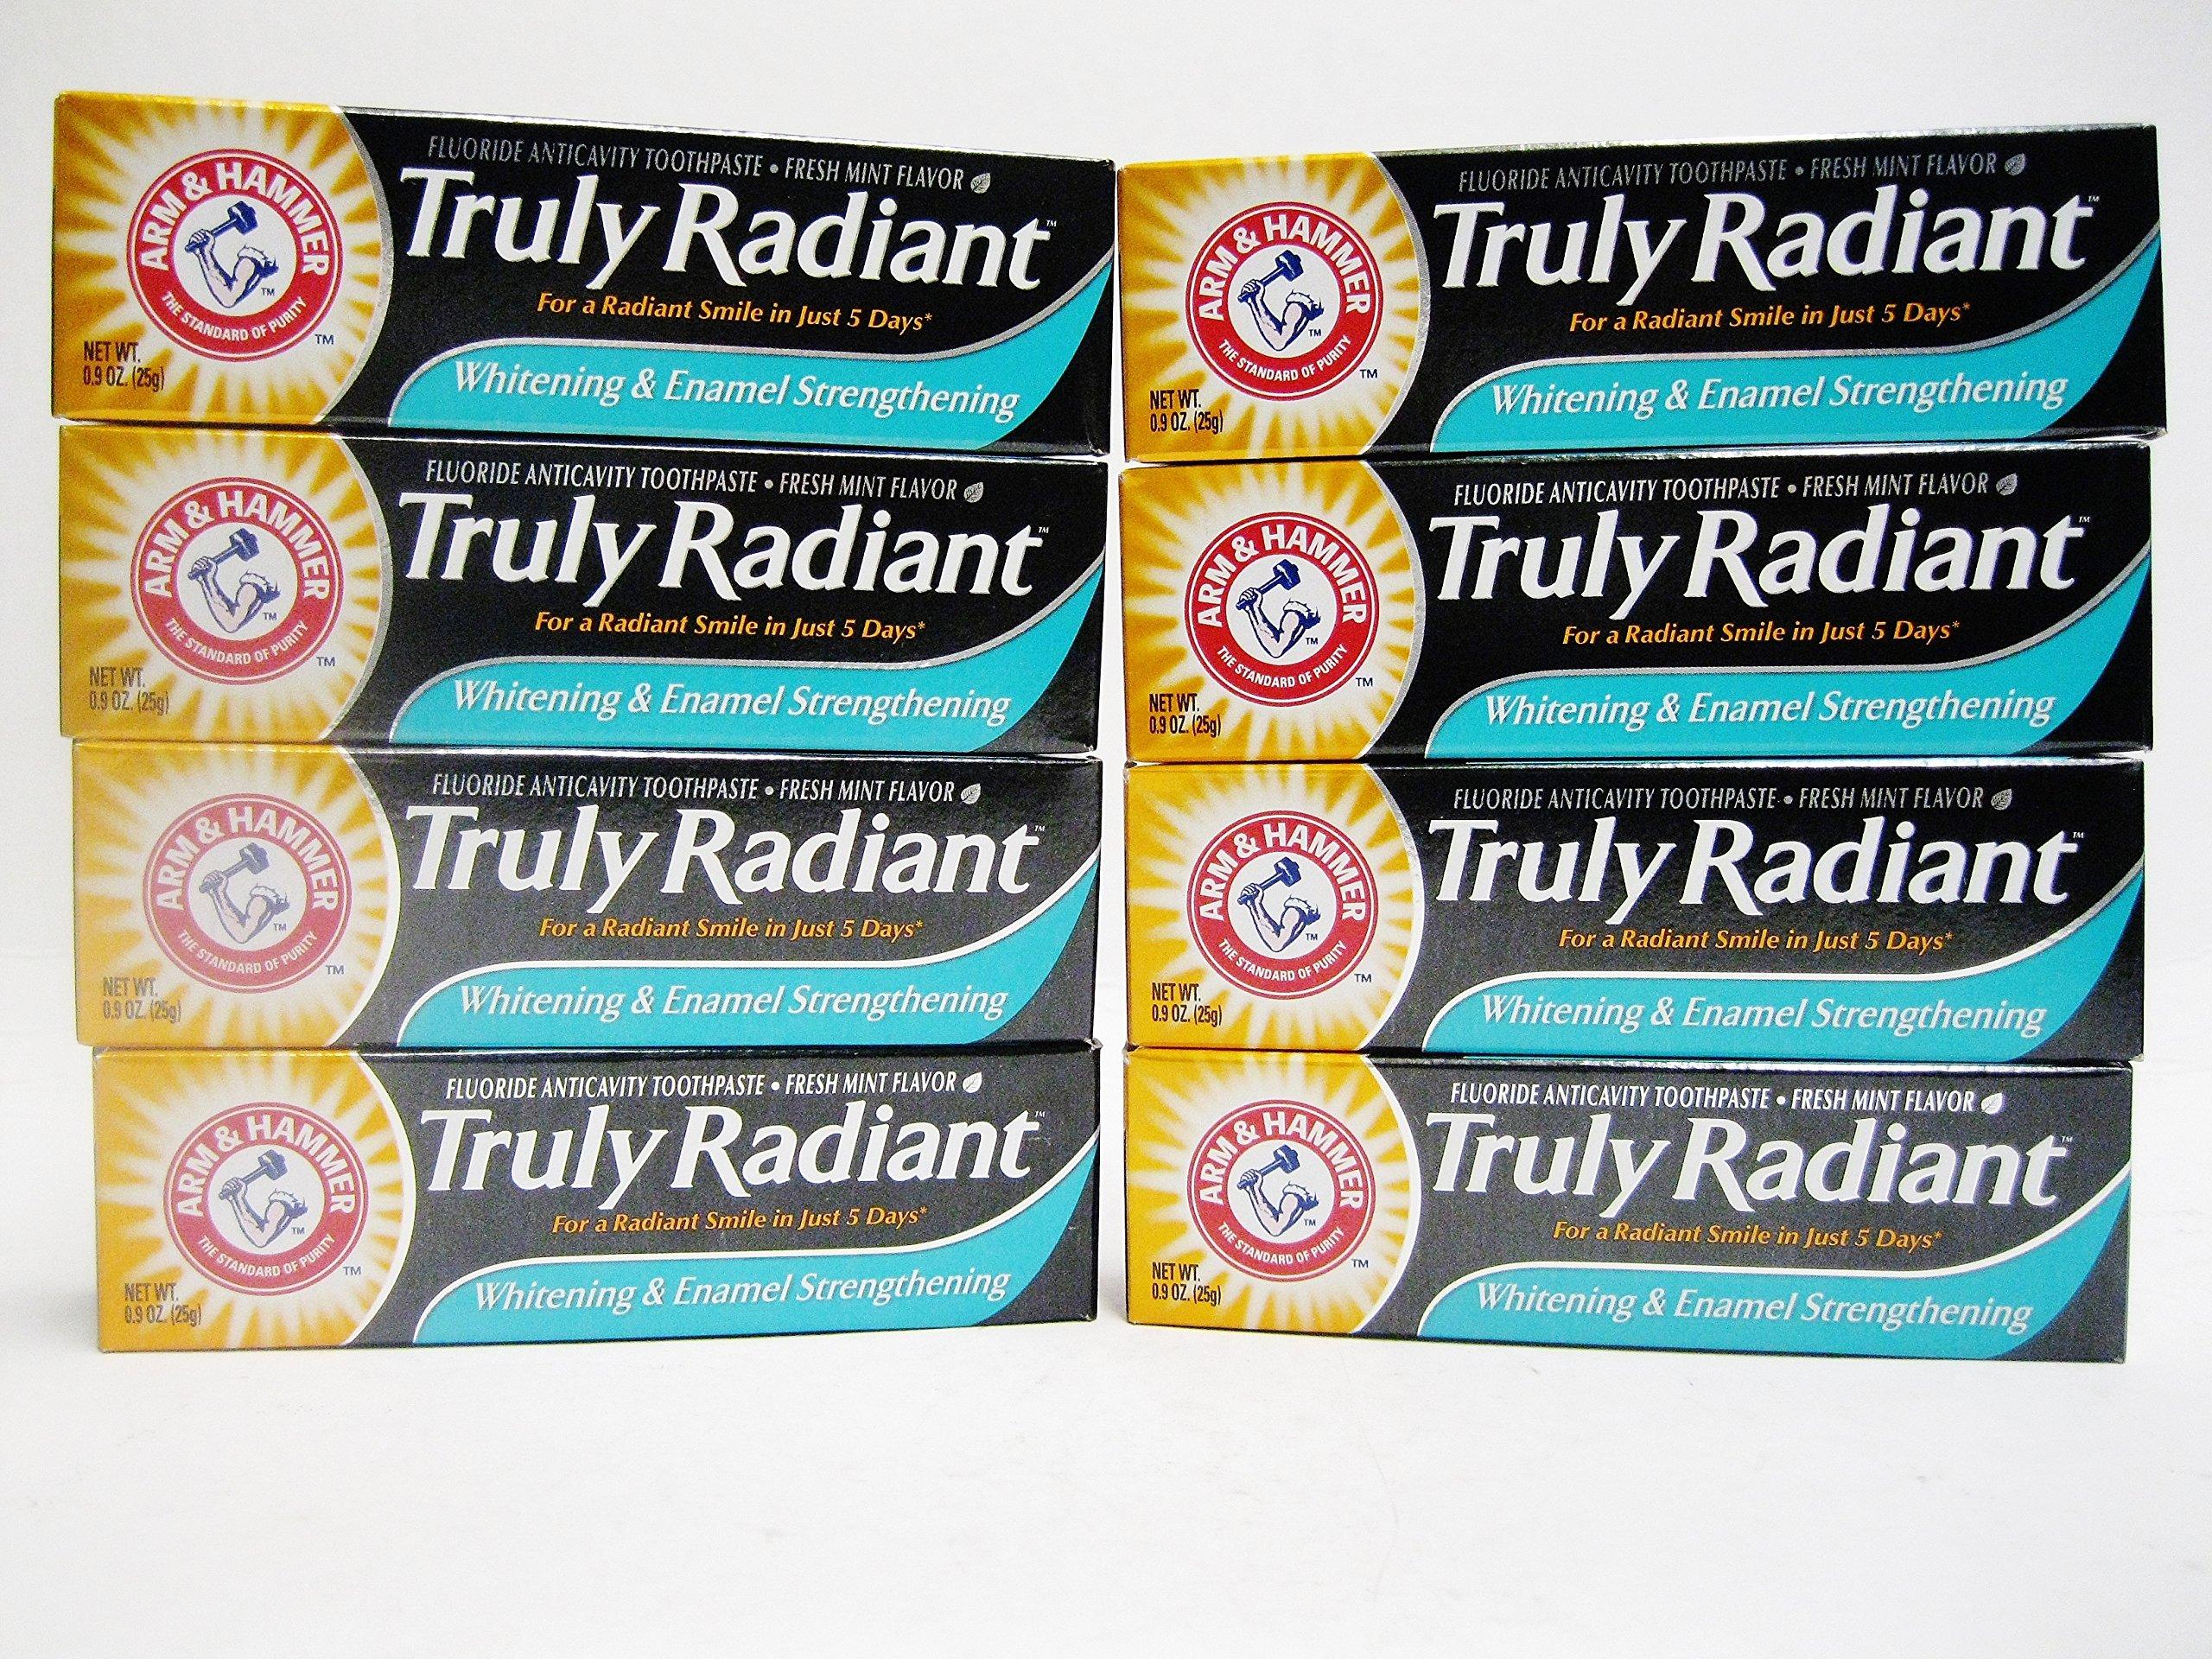 Arm & Hammer Truly Radiant Whitening & Enamel Strengthening Toothpaste Travel Size 0.9oz = 25gr (8 pack)